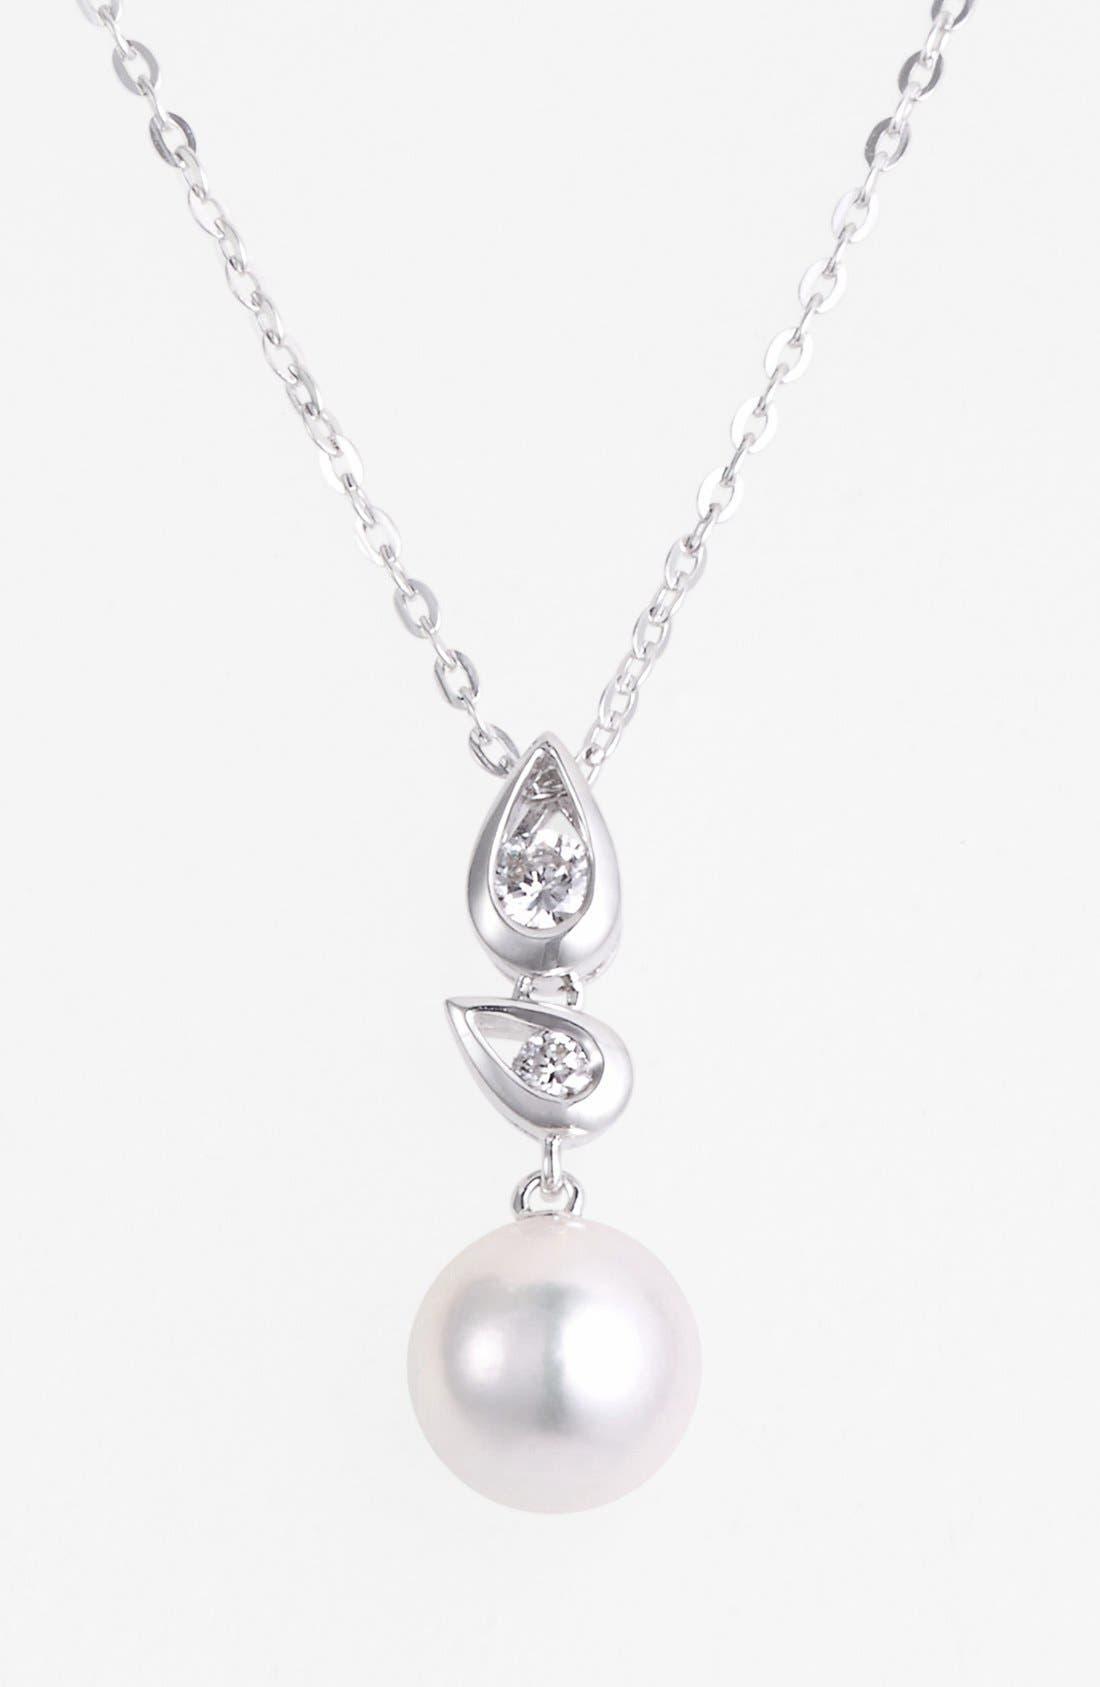 Main Image - Mikimoto Akoya Pearl & Diamond Pendant Necklace